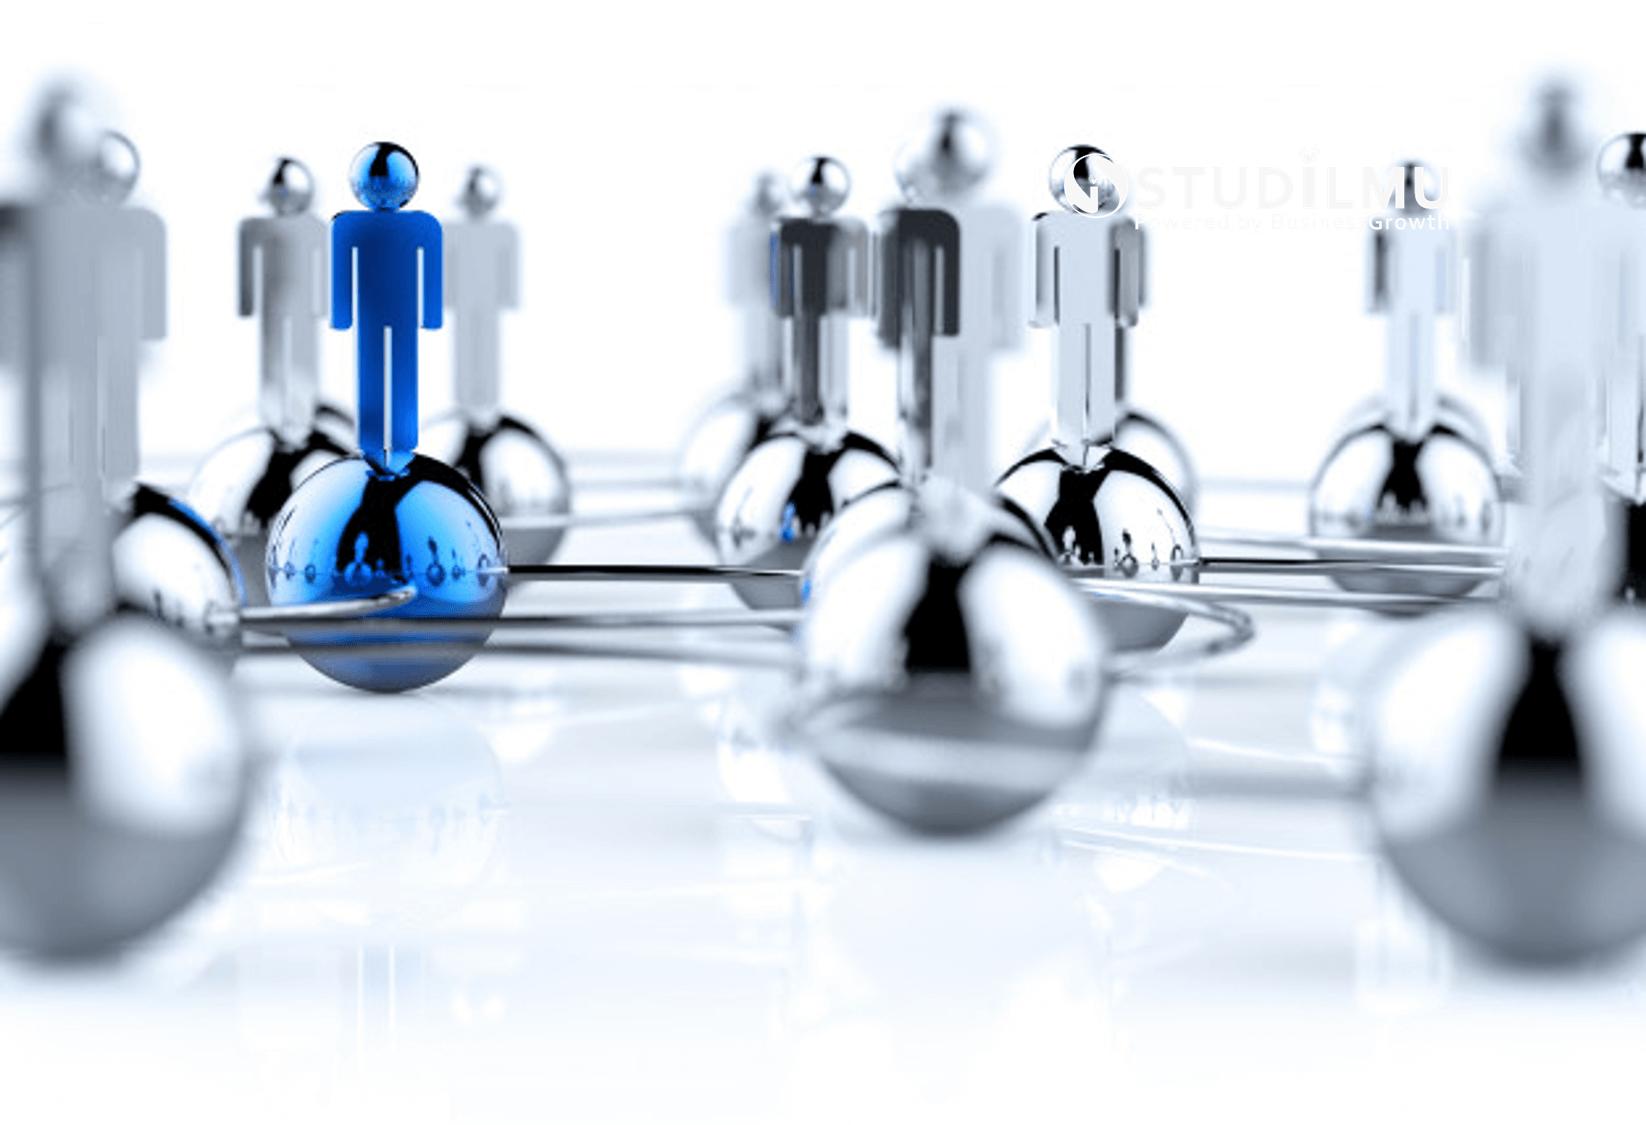 STUDILMU Career Advice - Pengertian Manajemen, Tujuan Manajemen dan Keterampilan Manajemen